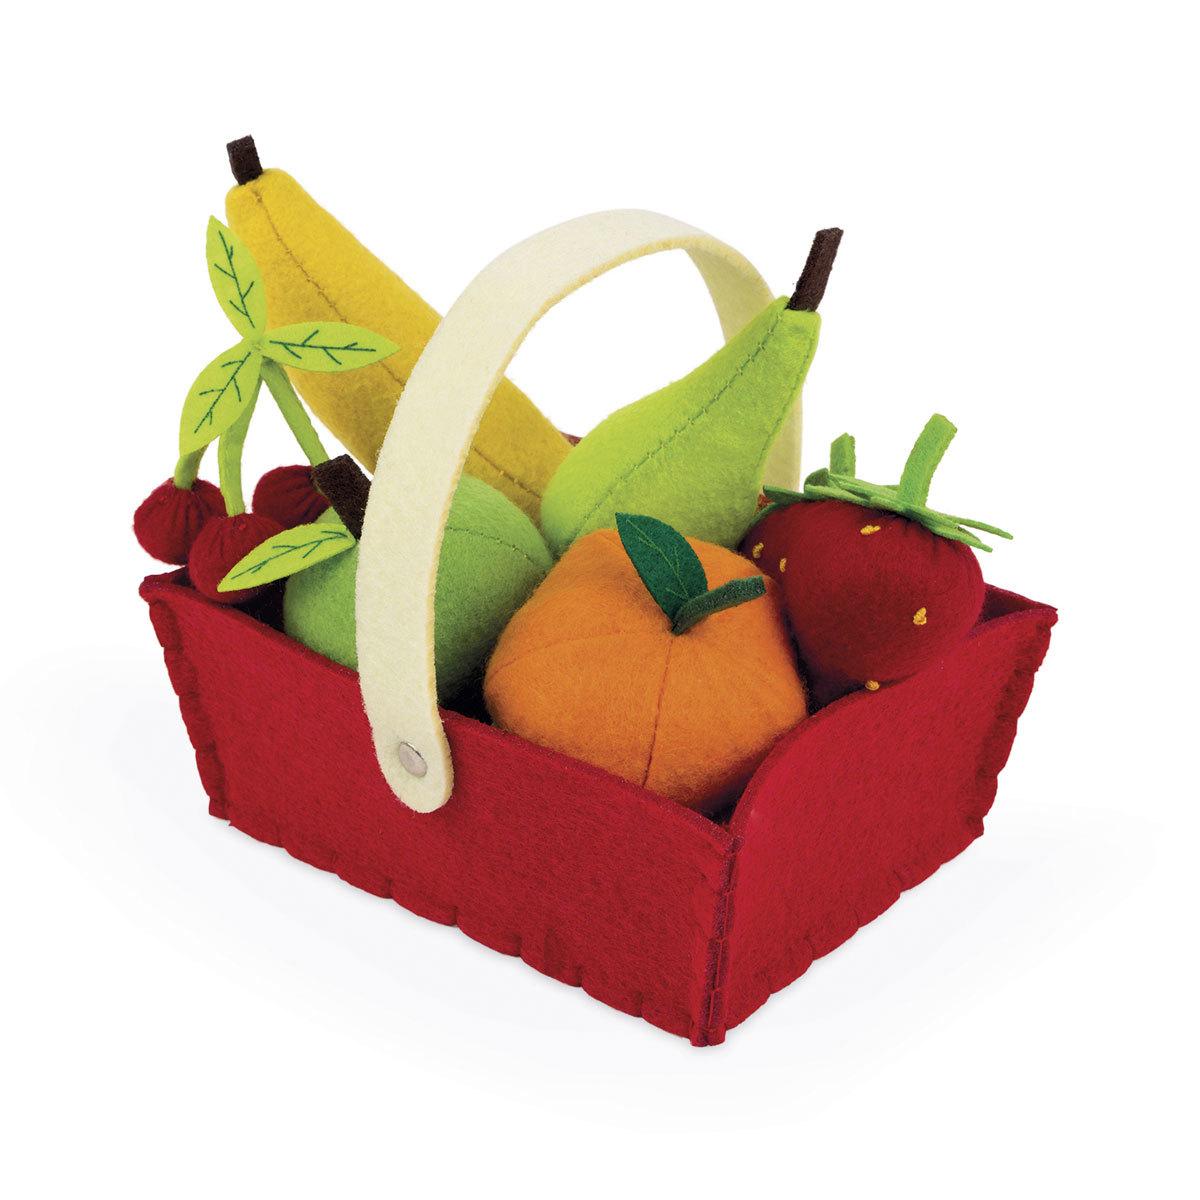 Mes premiers jouets Panier de 8 Fruits en Tissu Panier de 8 Fruits en Tissu